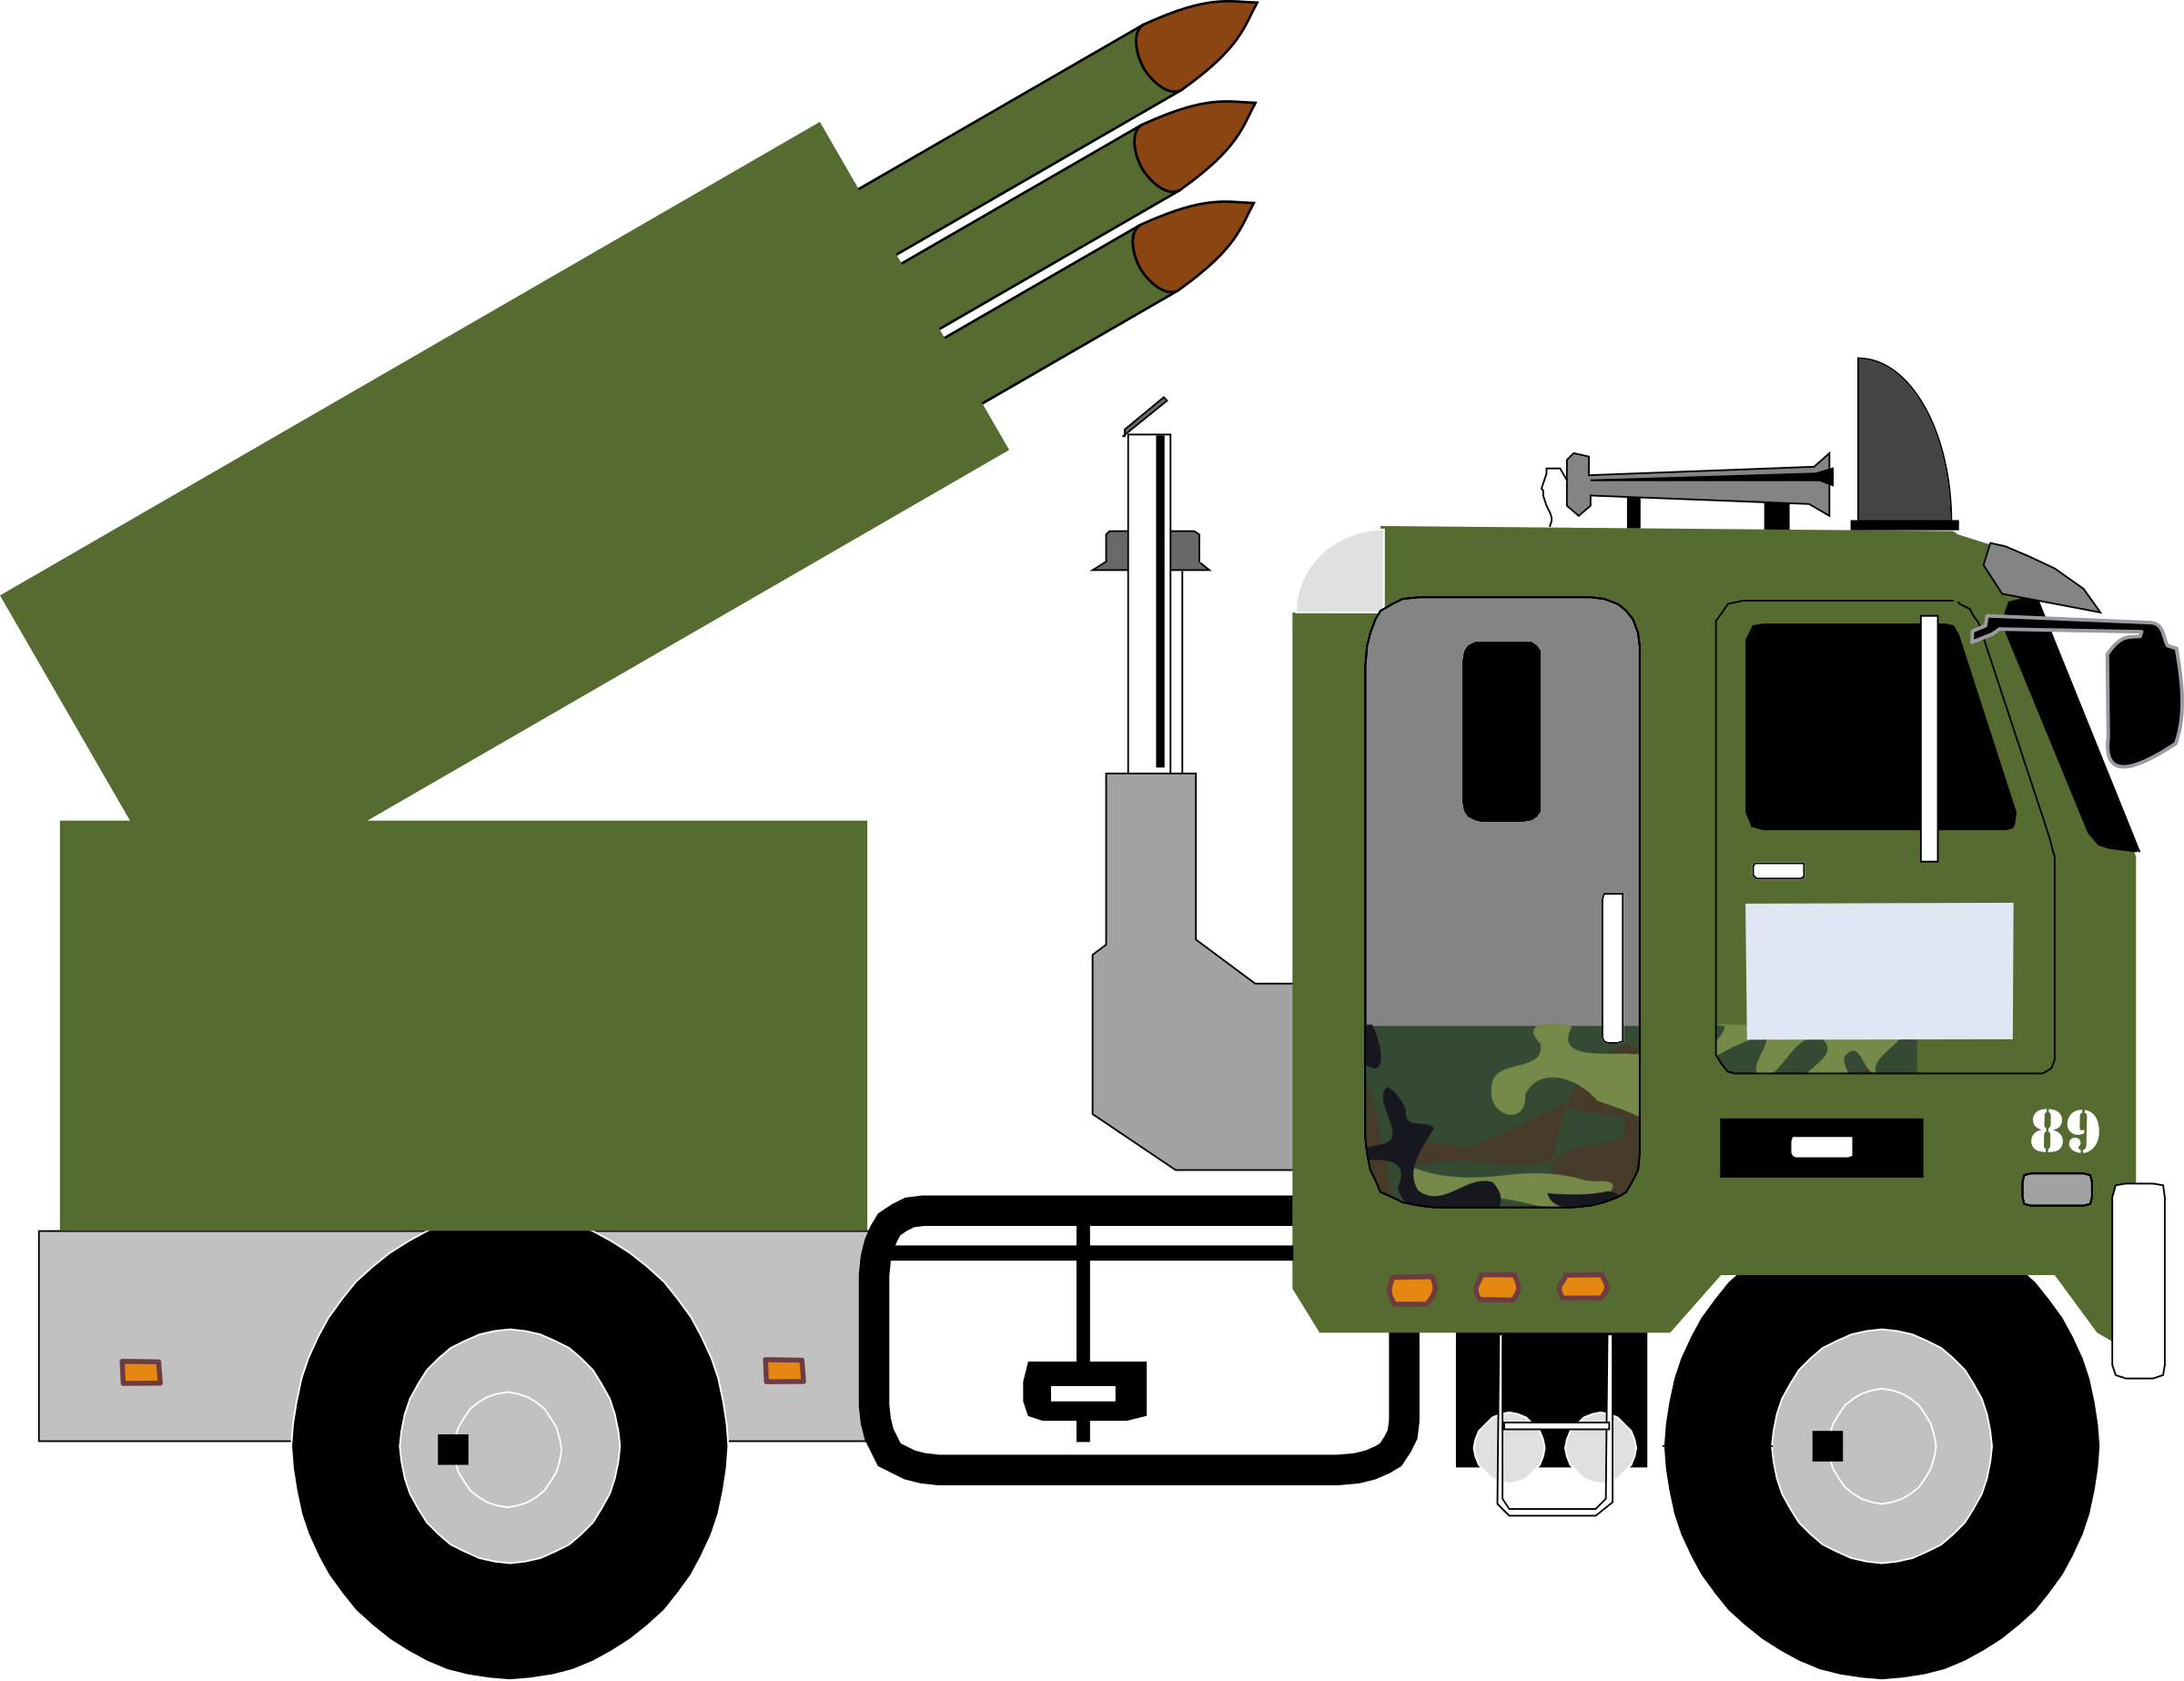 Car carrier truck clipart svg transparent stock Clipart - missile truck v4 svg transparent stock